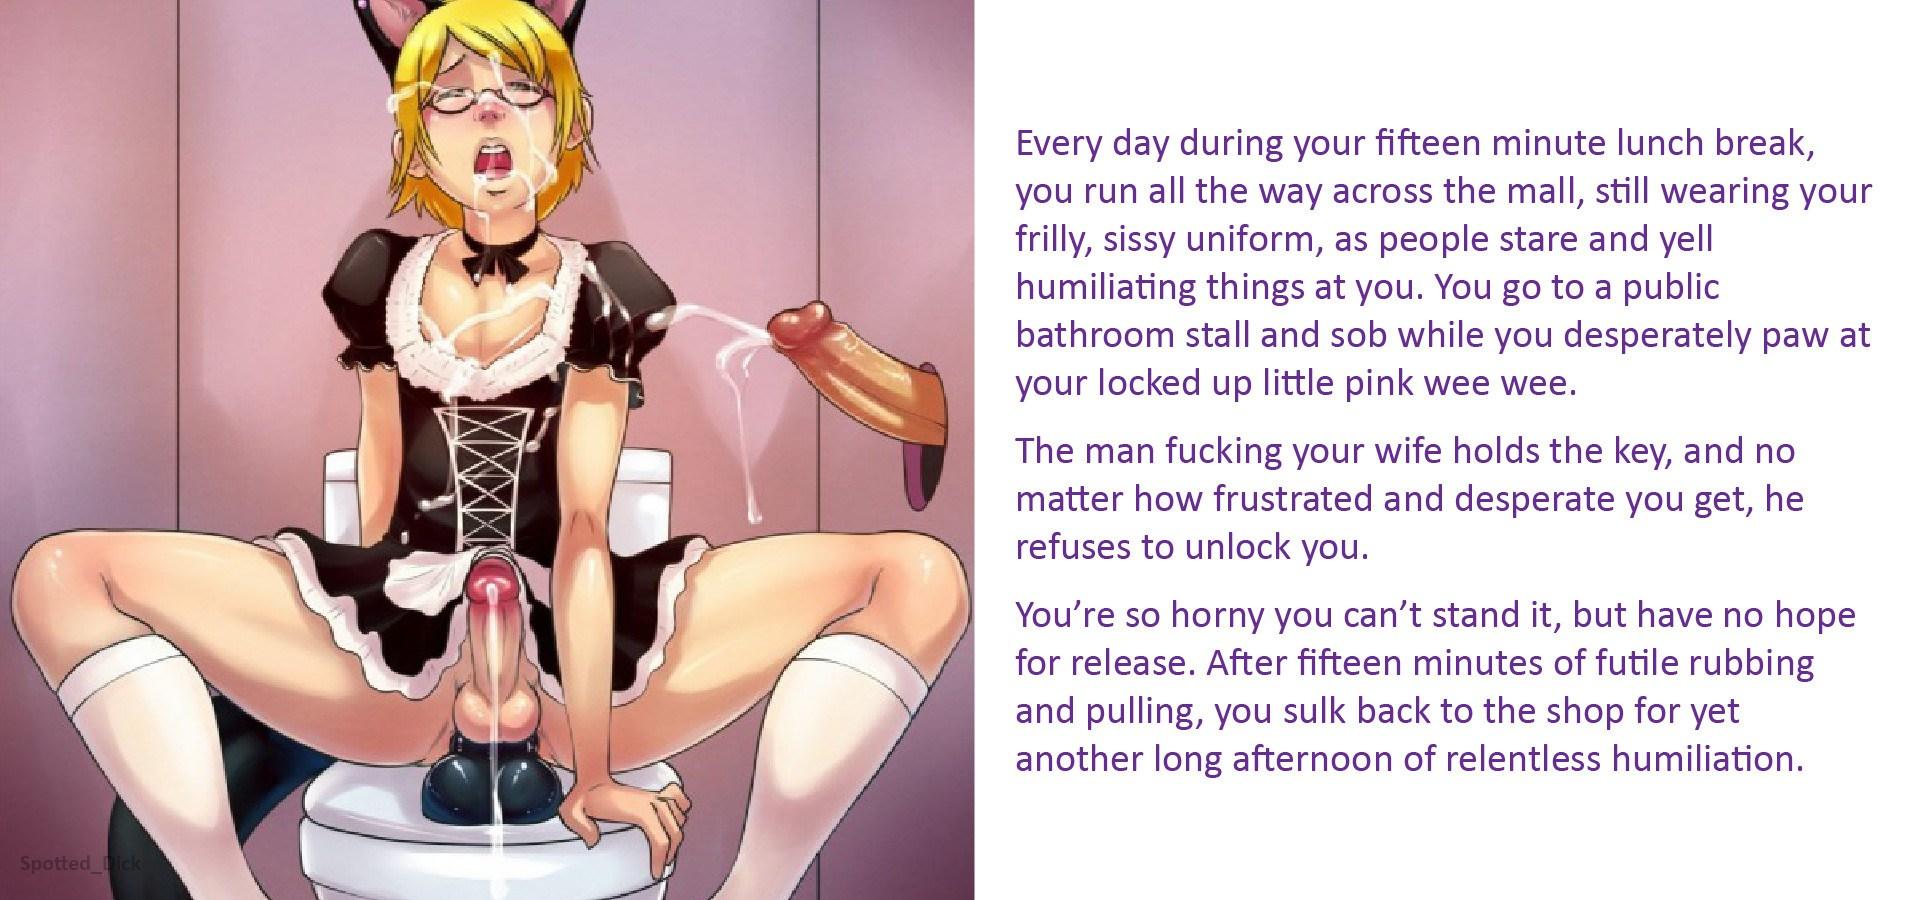 Hentai Scat Humiliation Porn Captions Lesbian Scat Humiliation Hentai Porn Lesbian Humiliation Hentai Lesbian